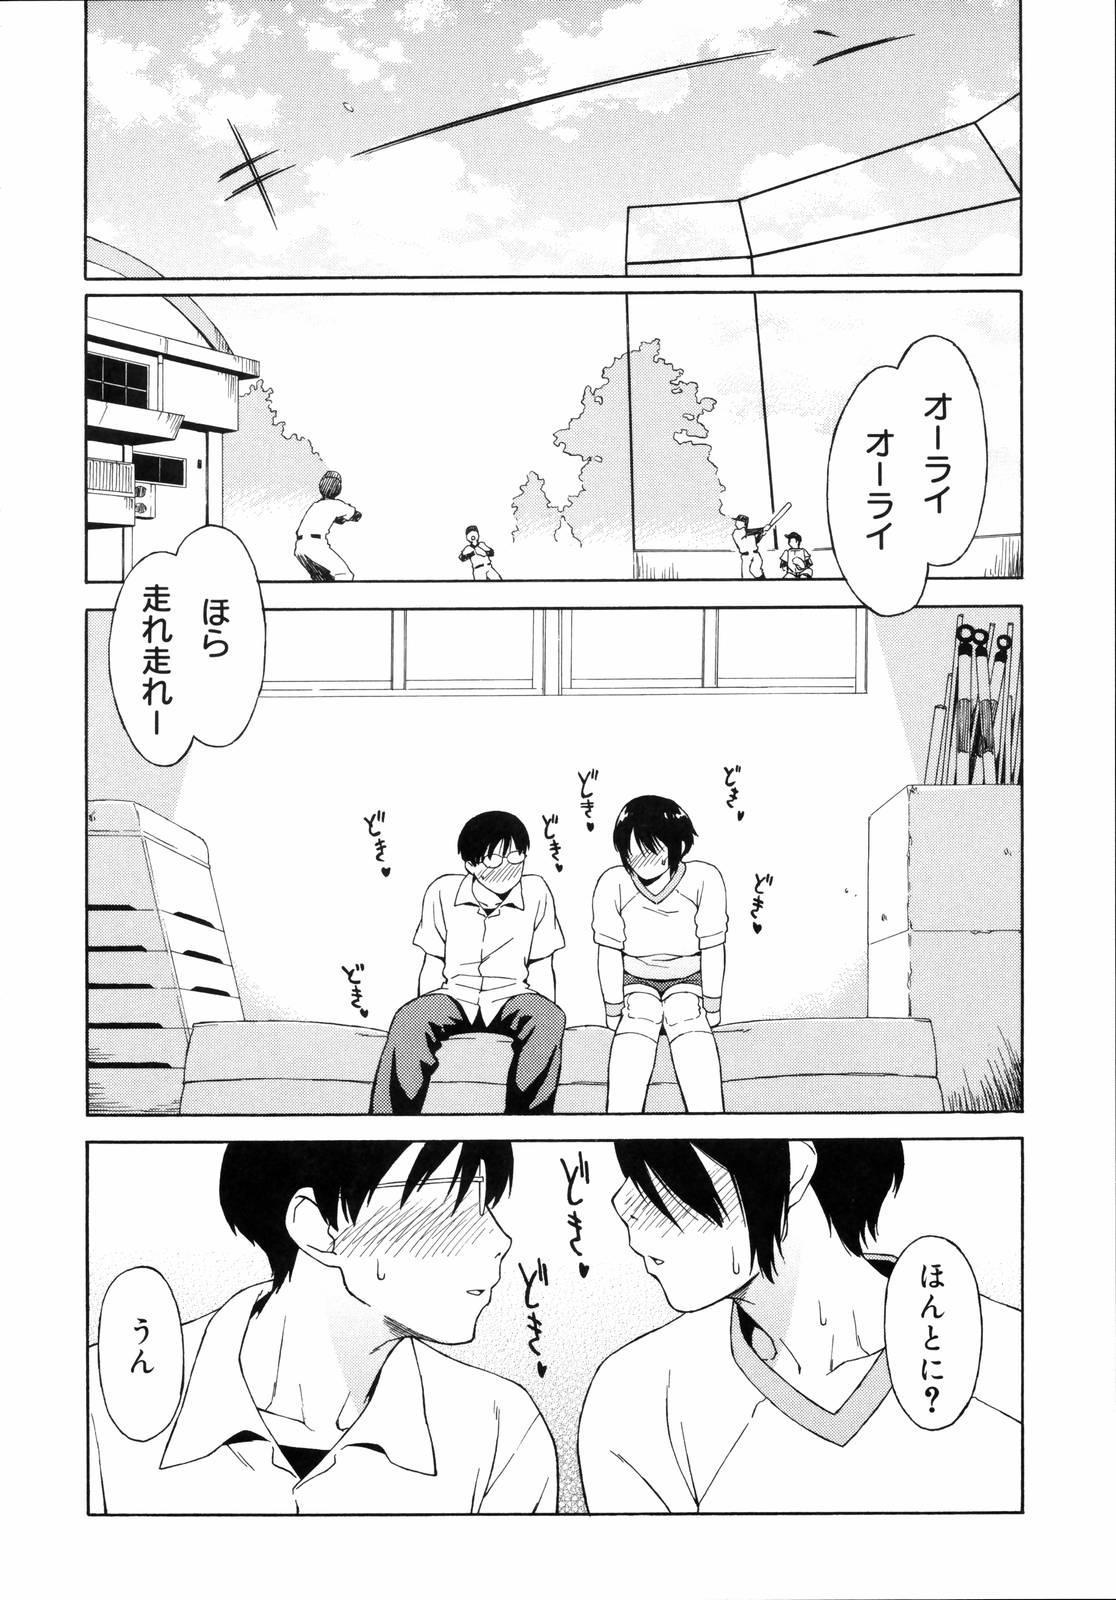 Shishunki wa Hatsujouki - Adolescence is a sexual excitement period. 11